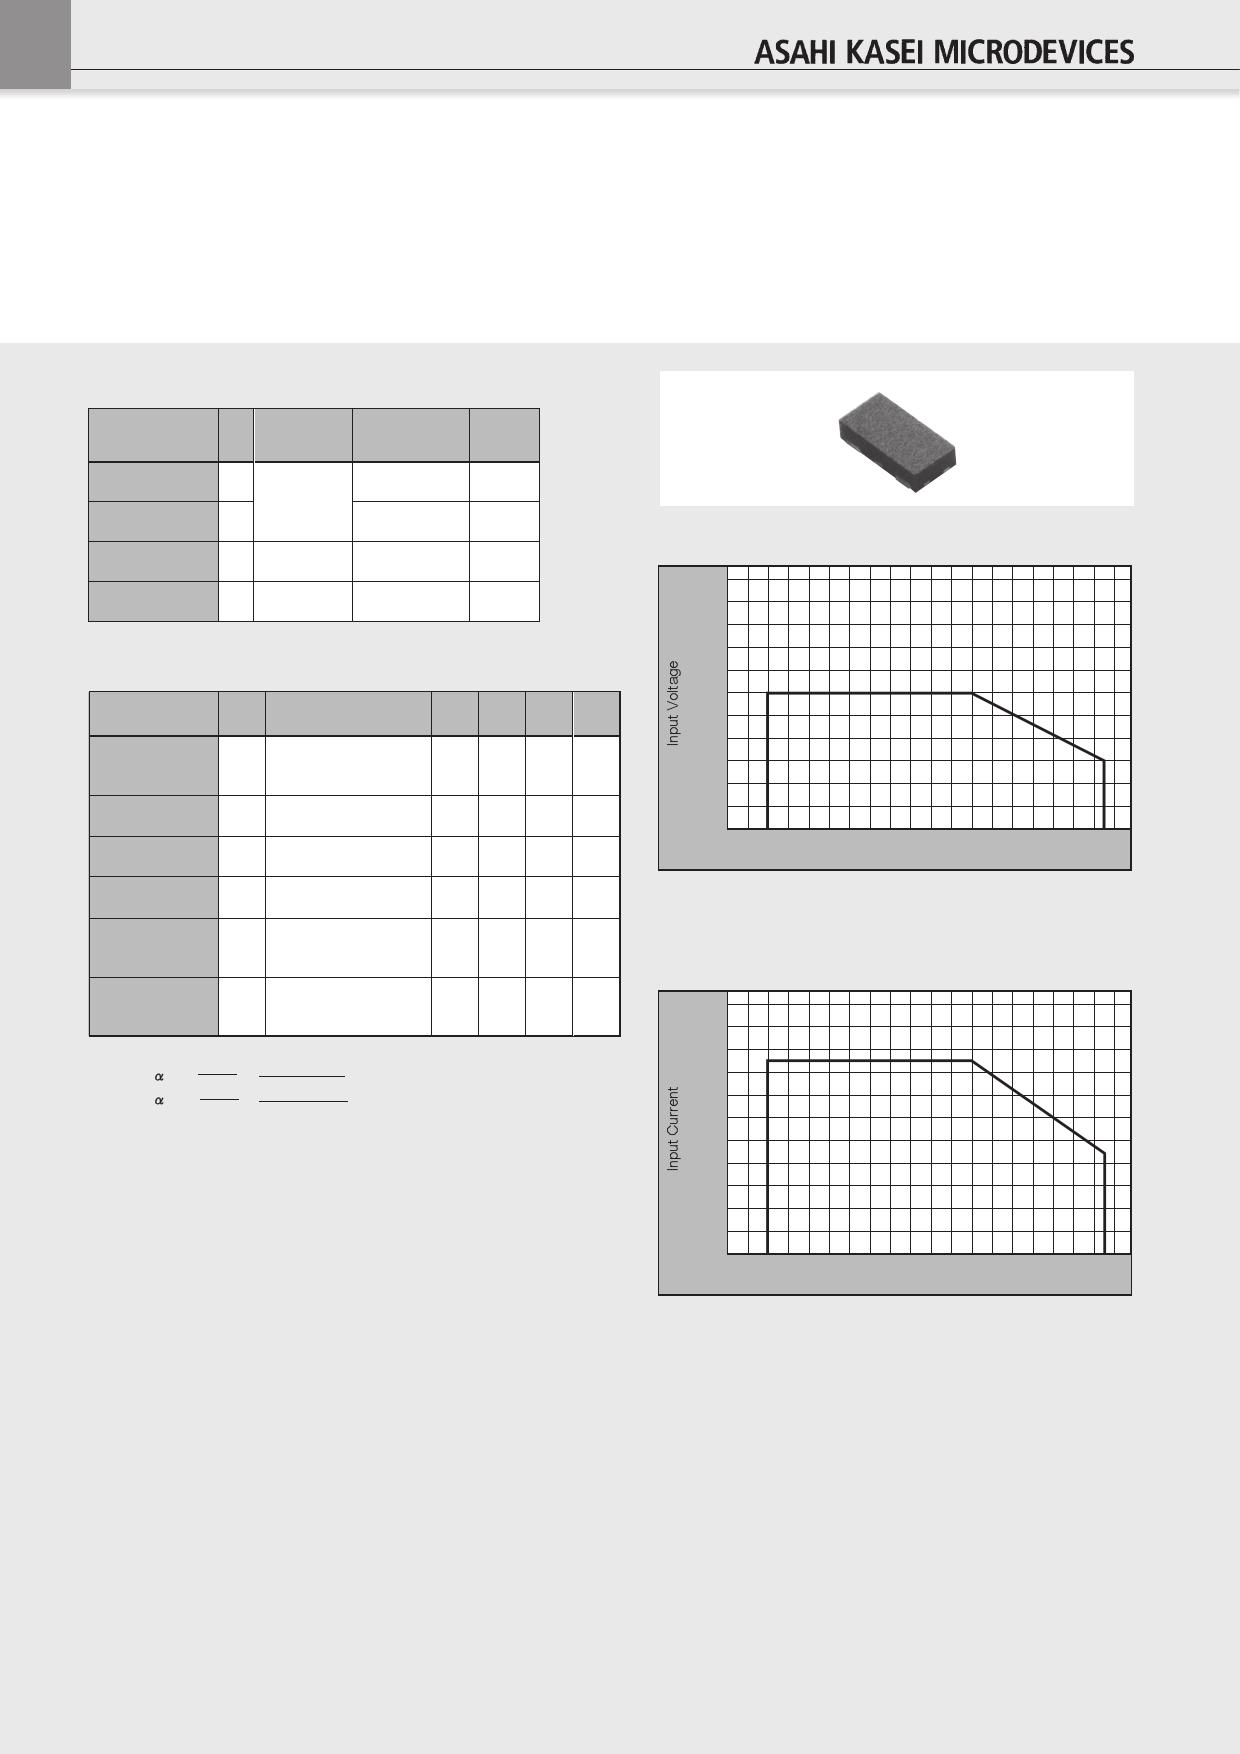 HQ-0811 Datasheet, HQ-0811 PDF,ピン配置, 機能